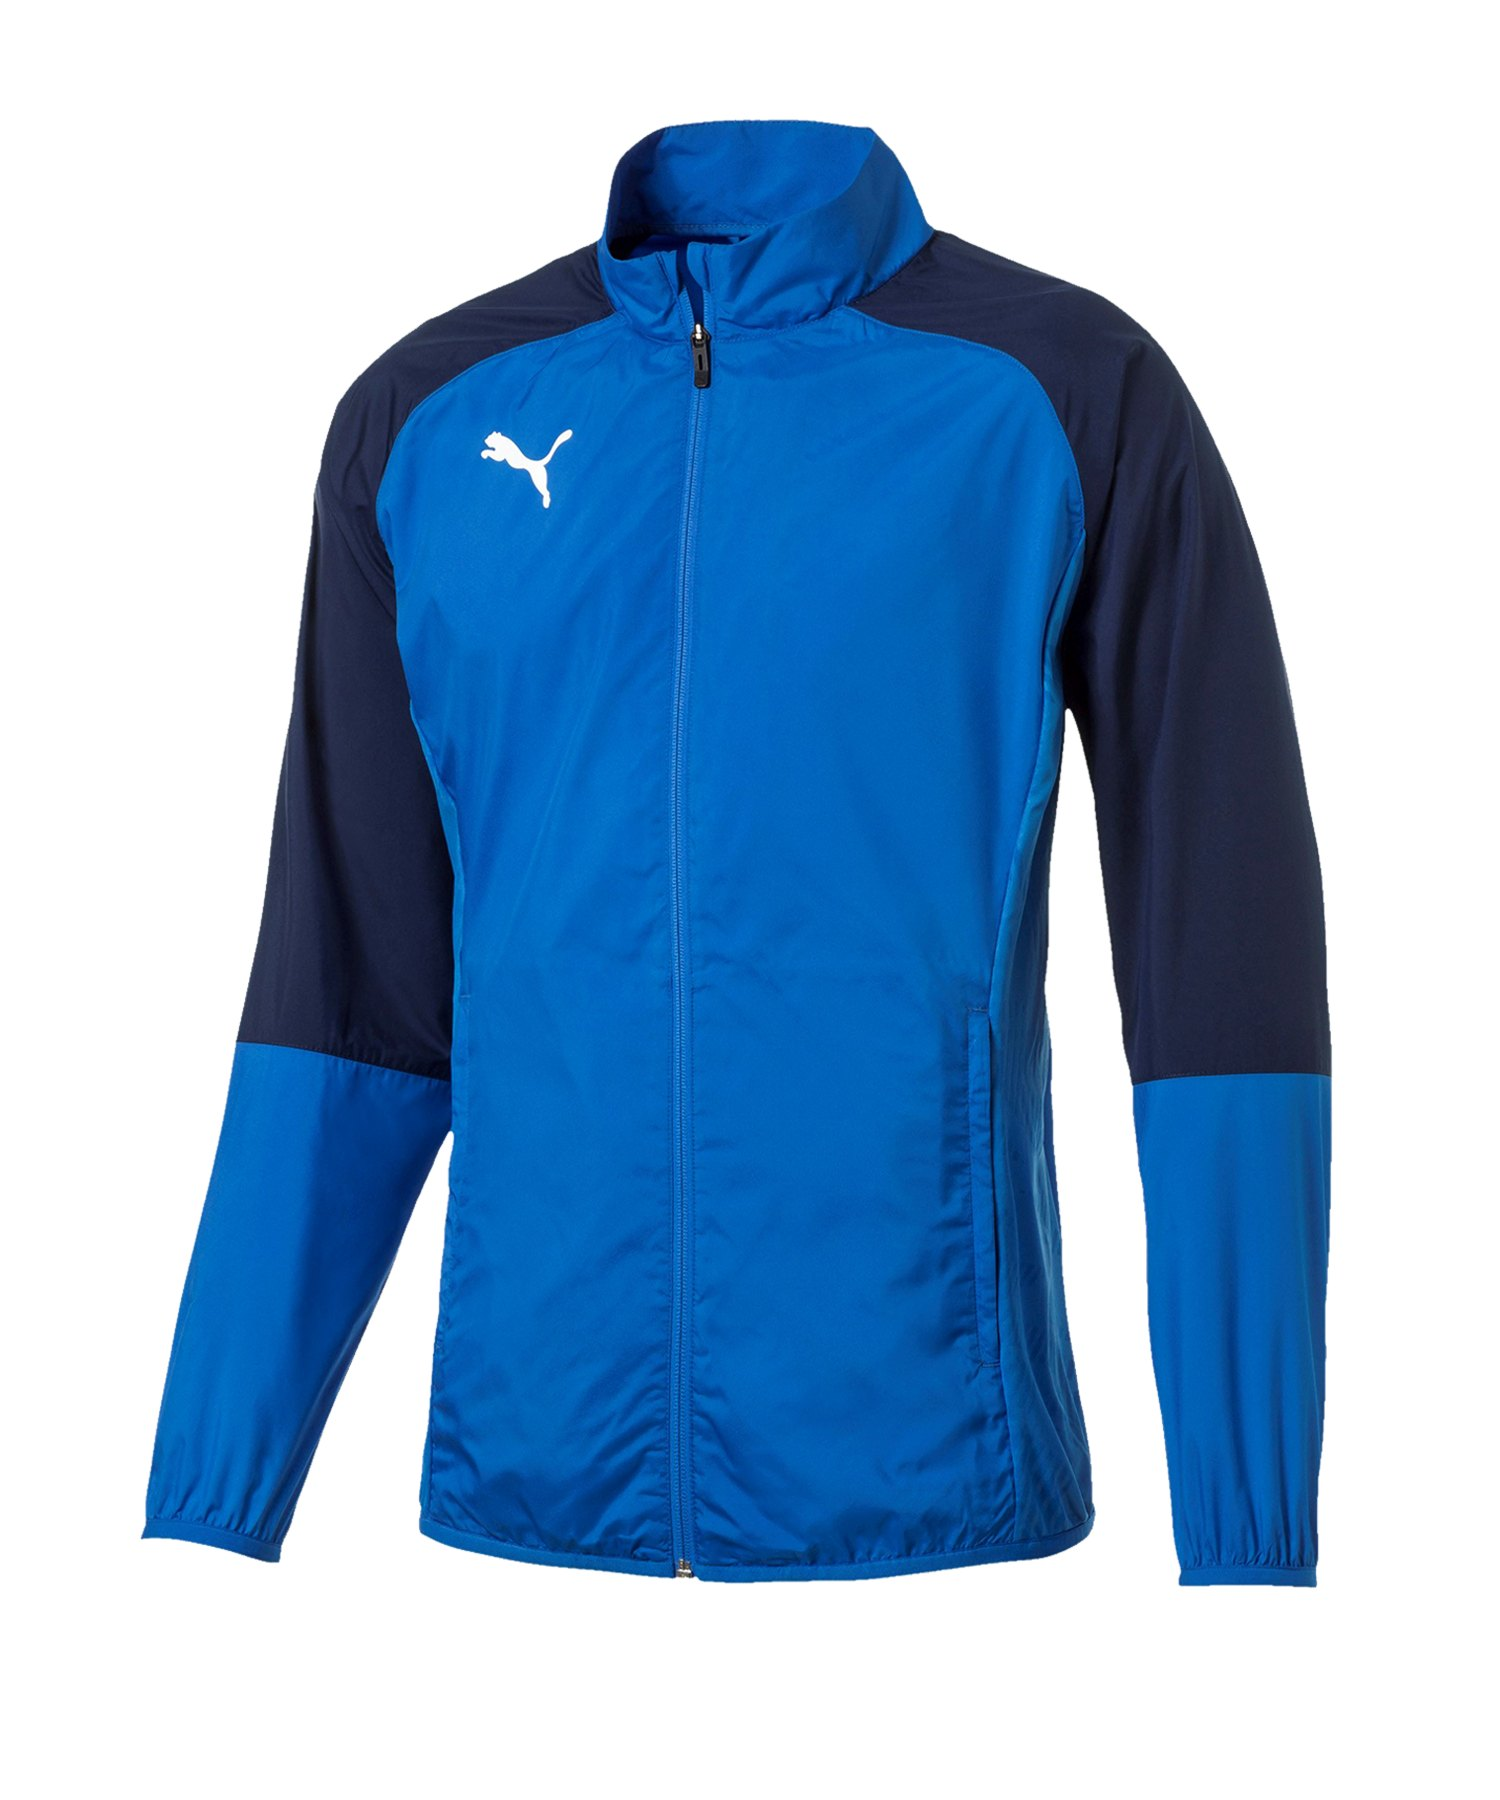 PUMA CUP Sideline Core Woven Jacket Kids Blau F02 - blau